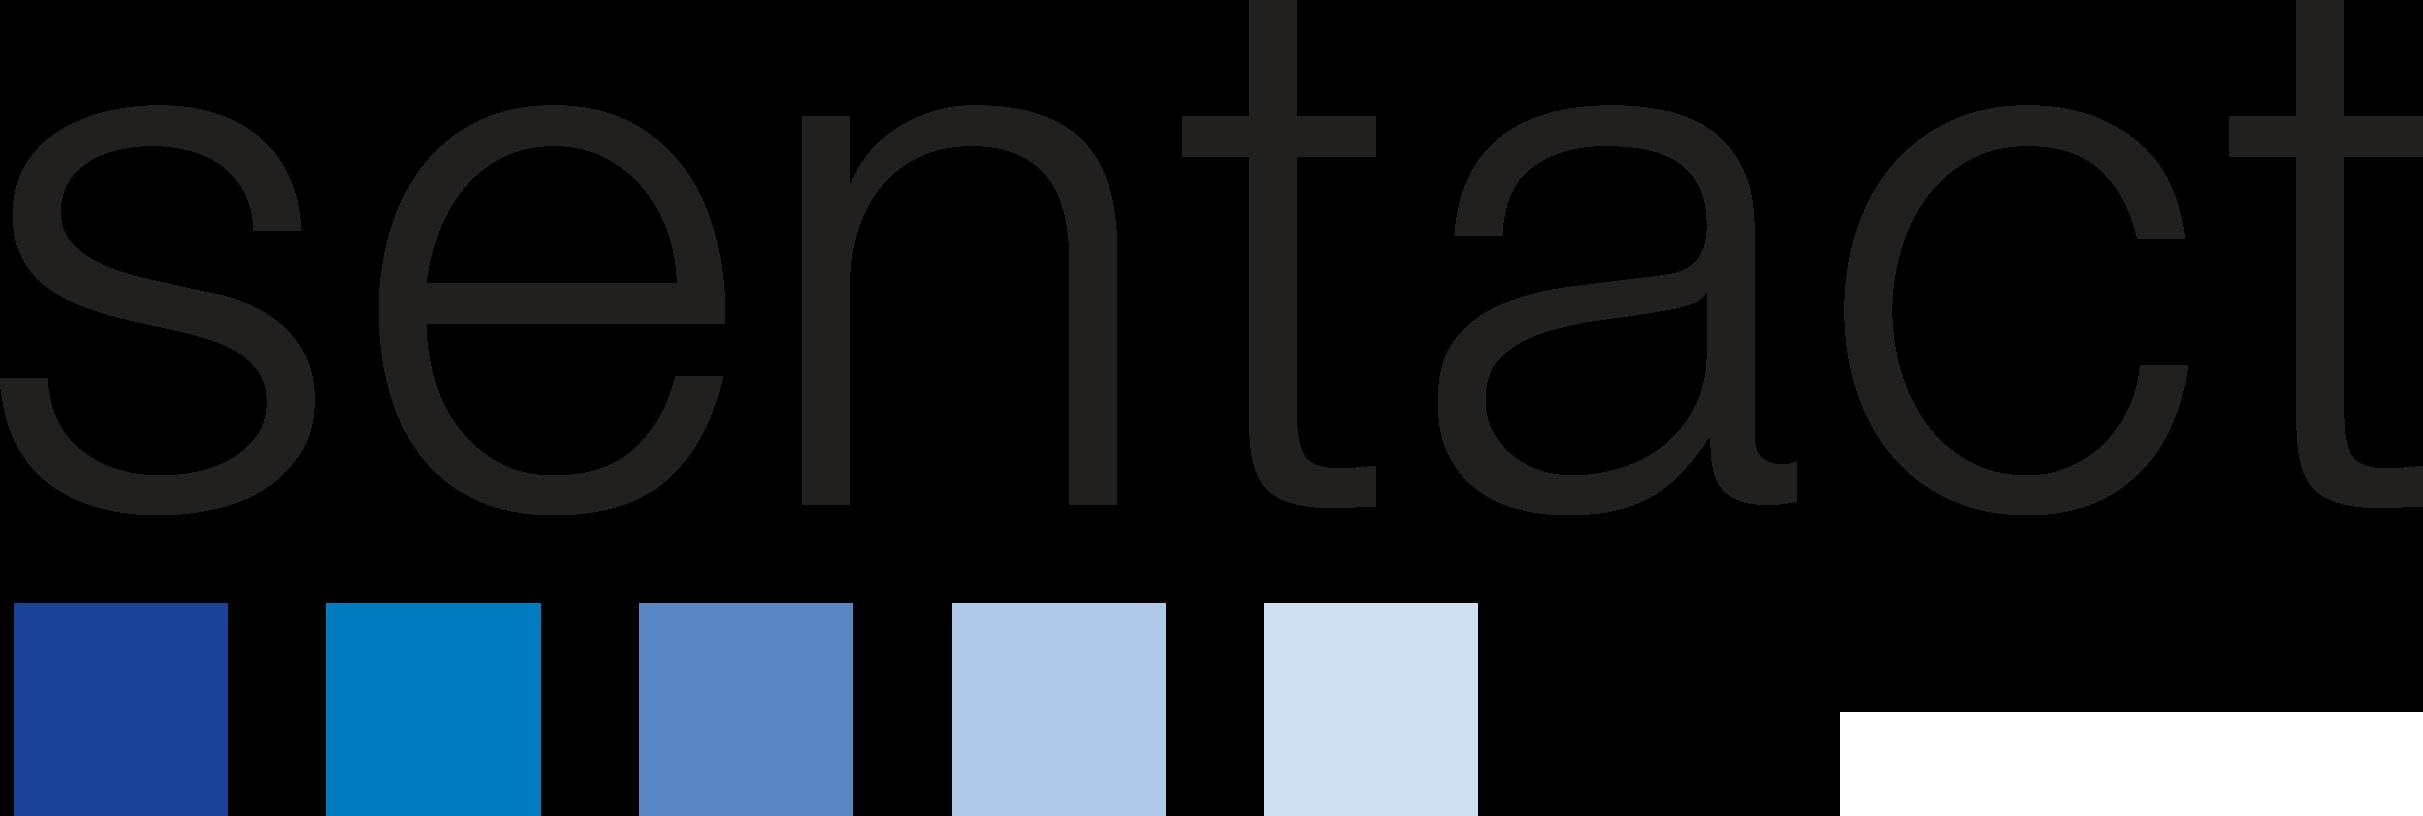 sentact logo